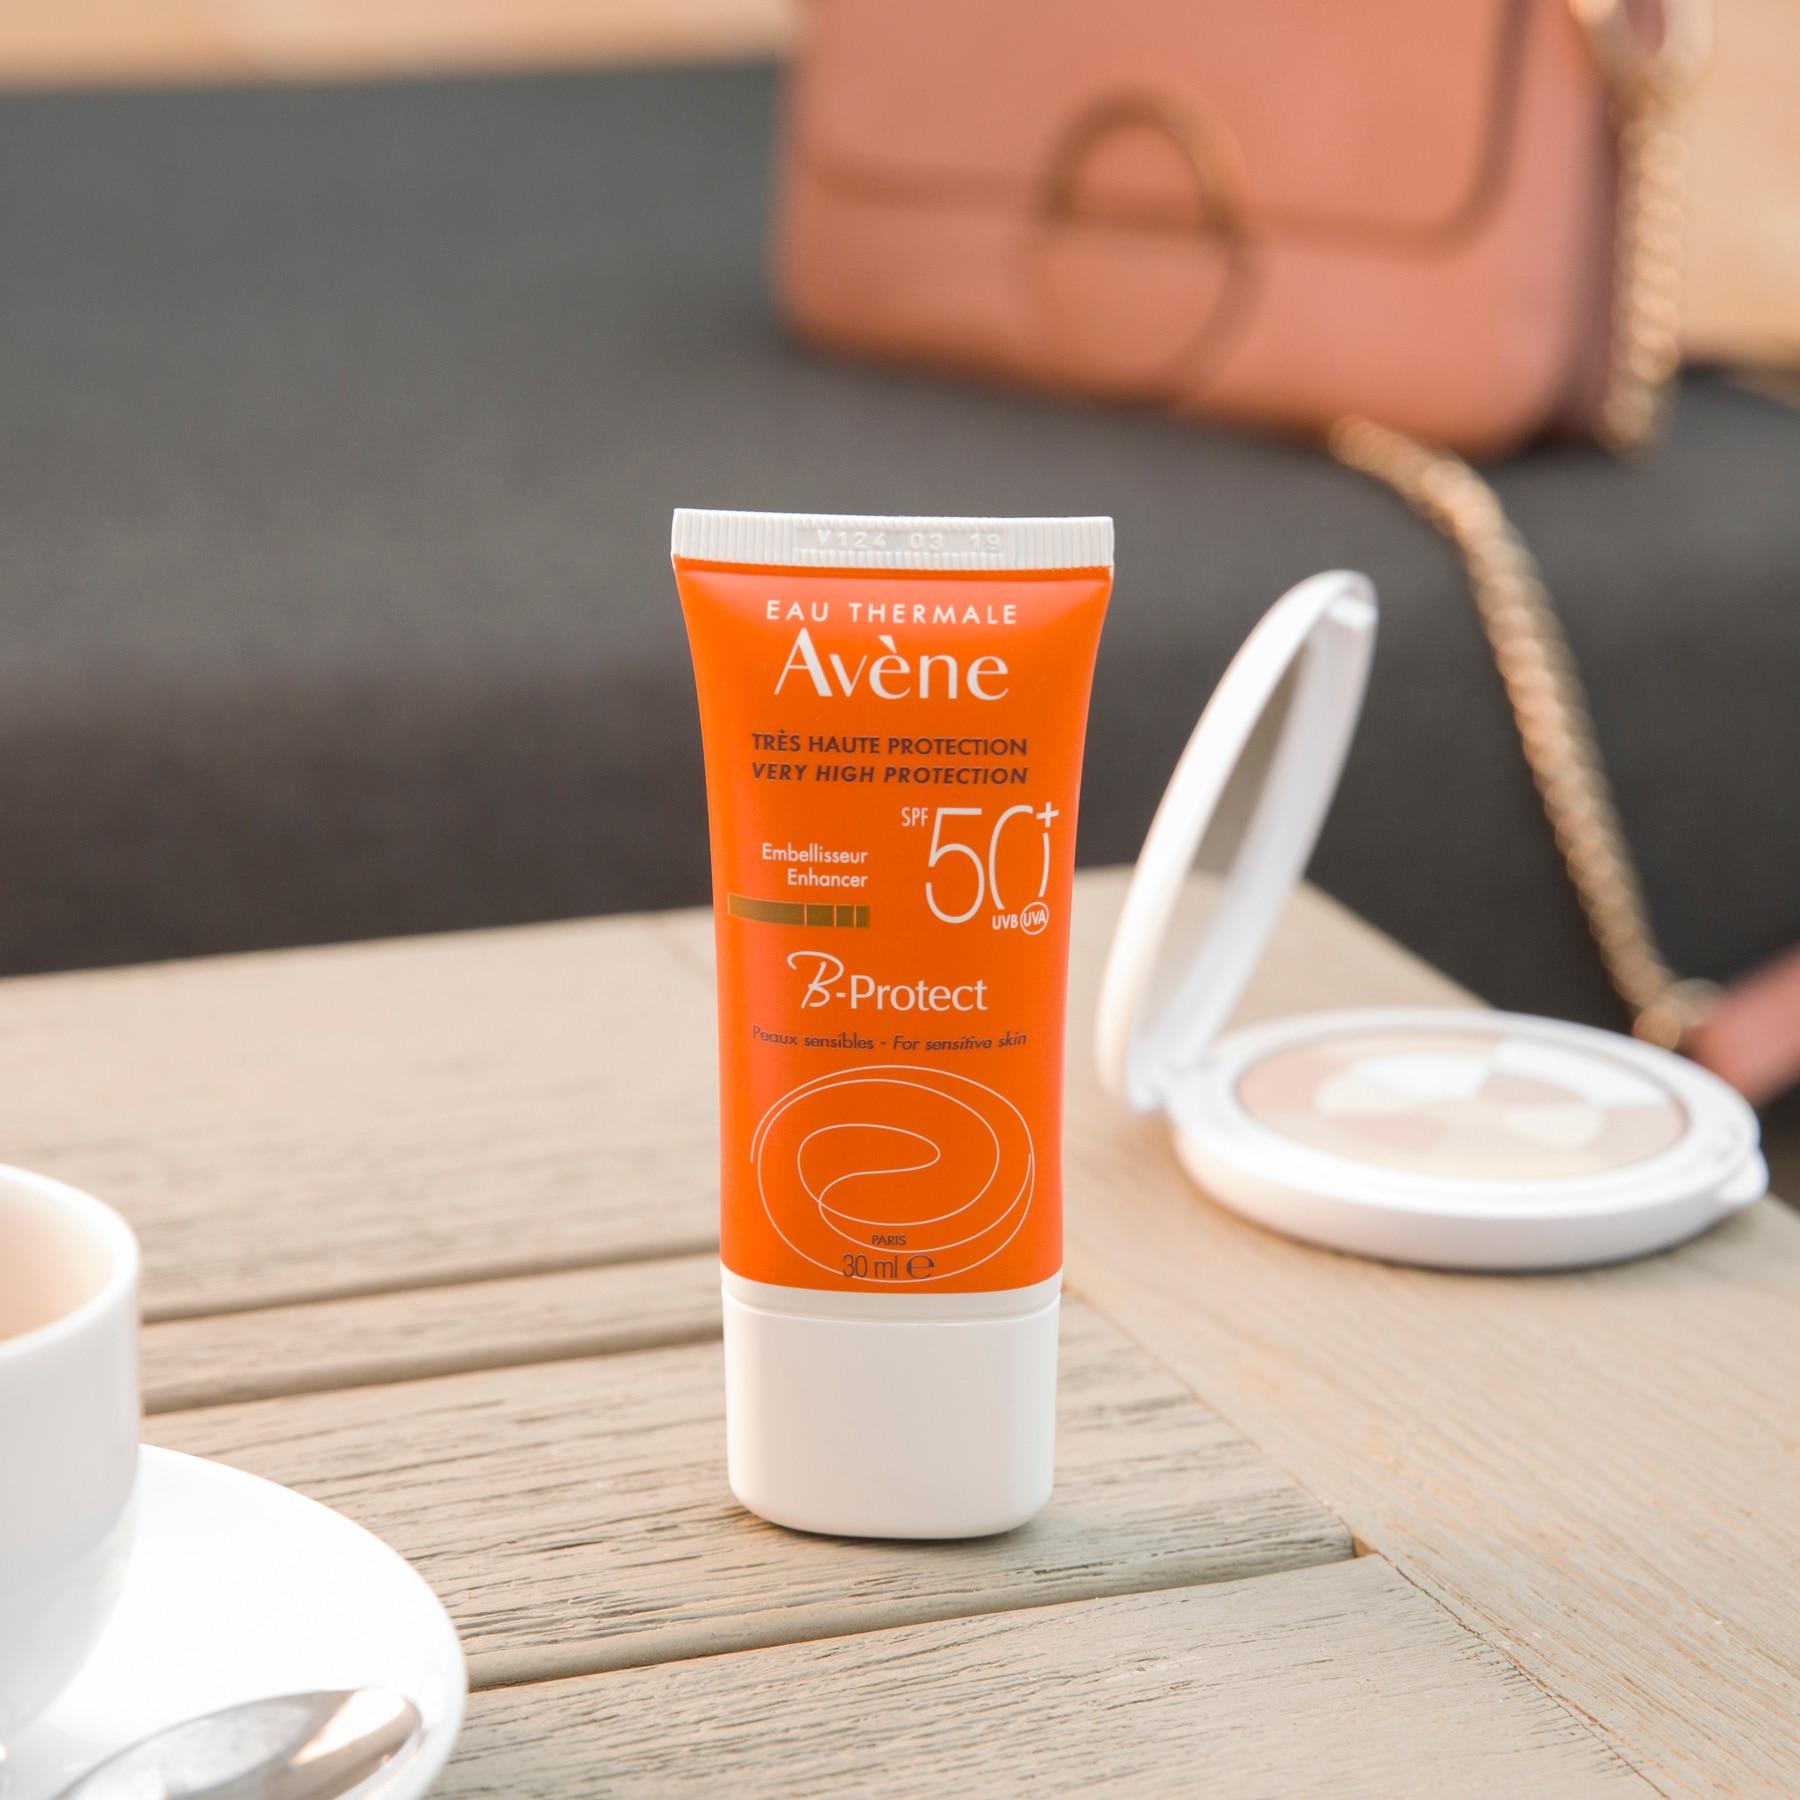 Eau Thermale Avène - B-protect SPF 50+